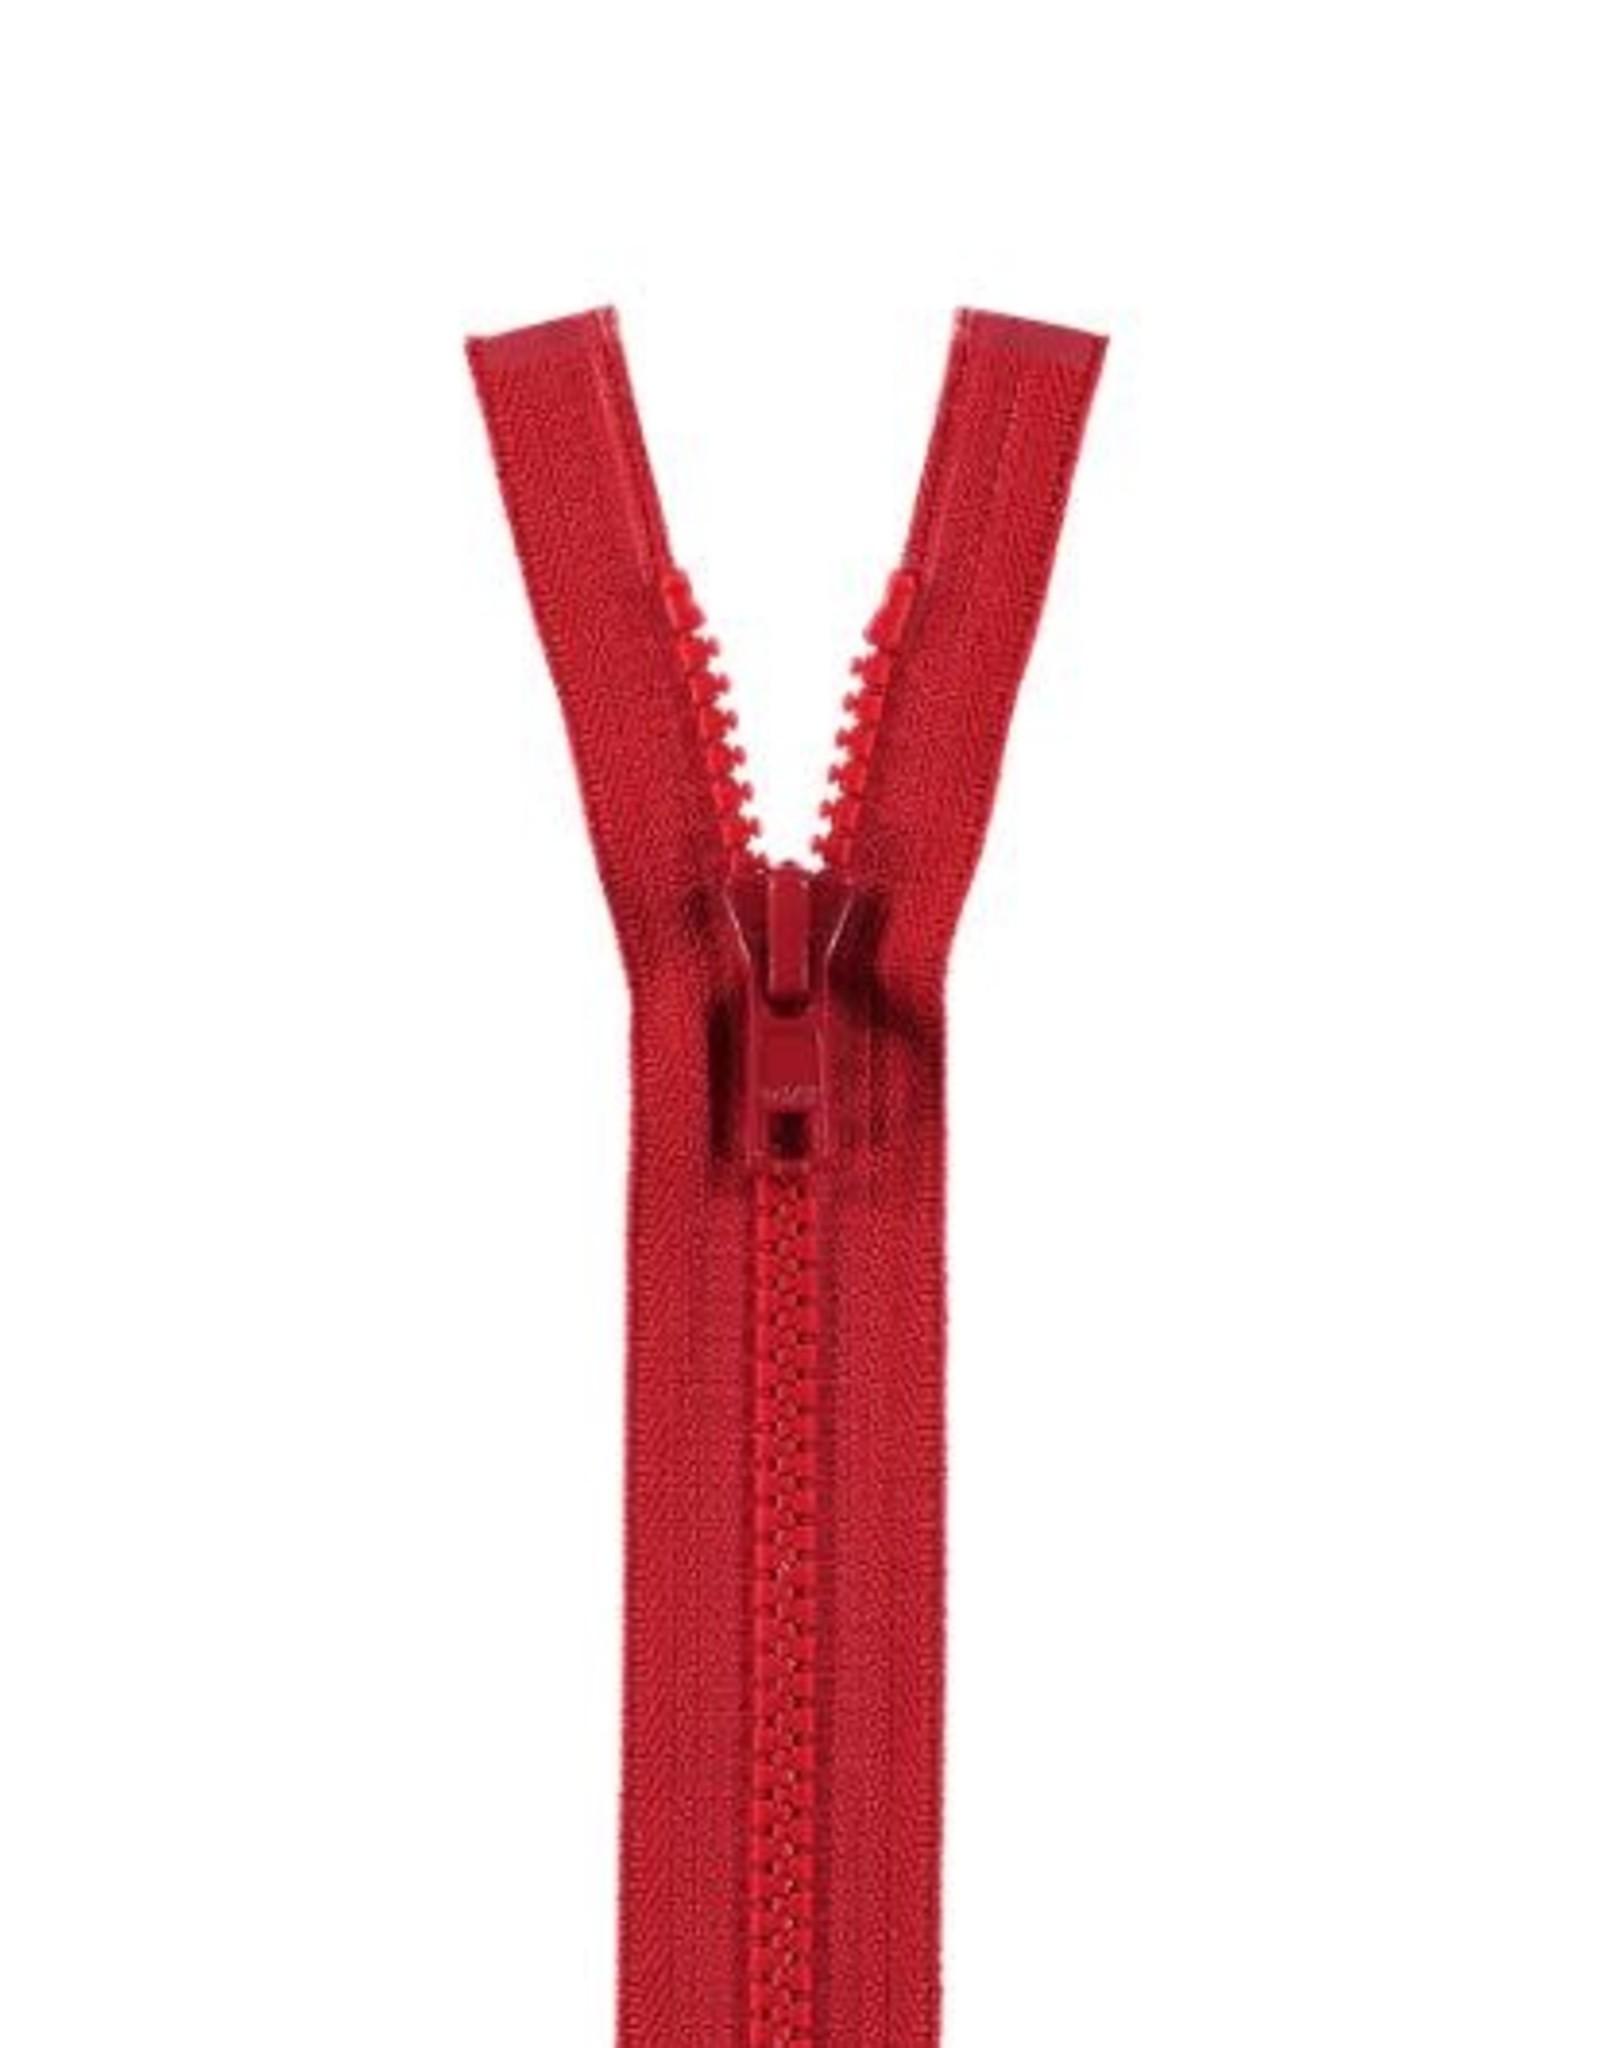 YKK BLOKRITS 5 DEELBAAR rood 519-40cm